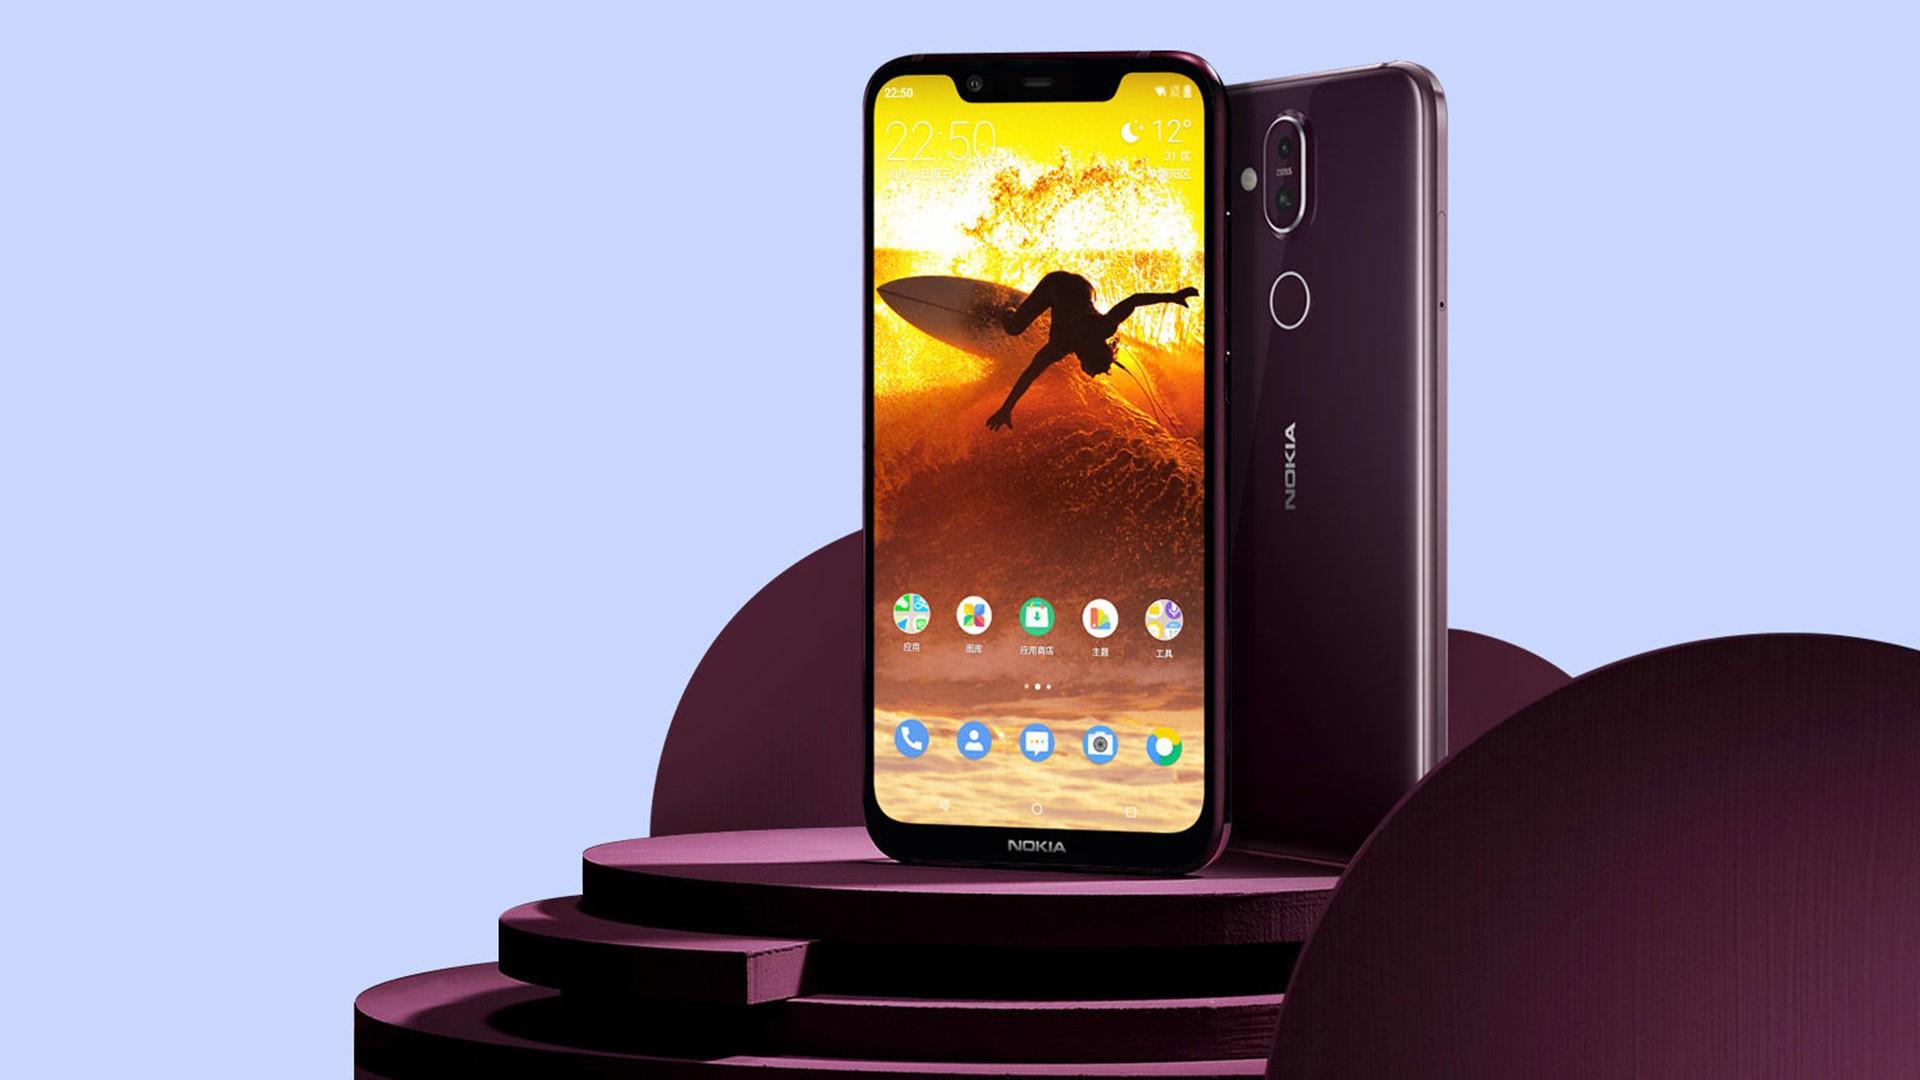 Nokia Smartphone